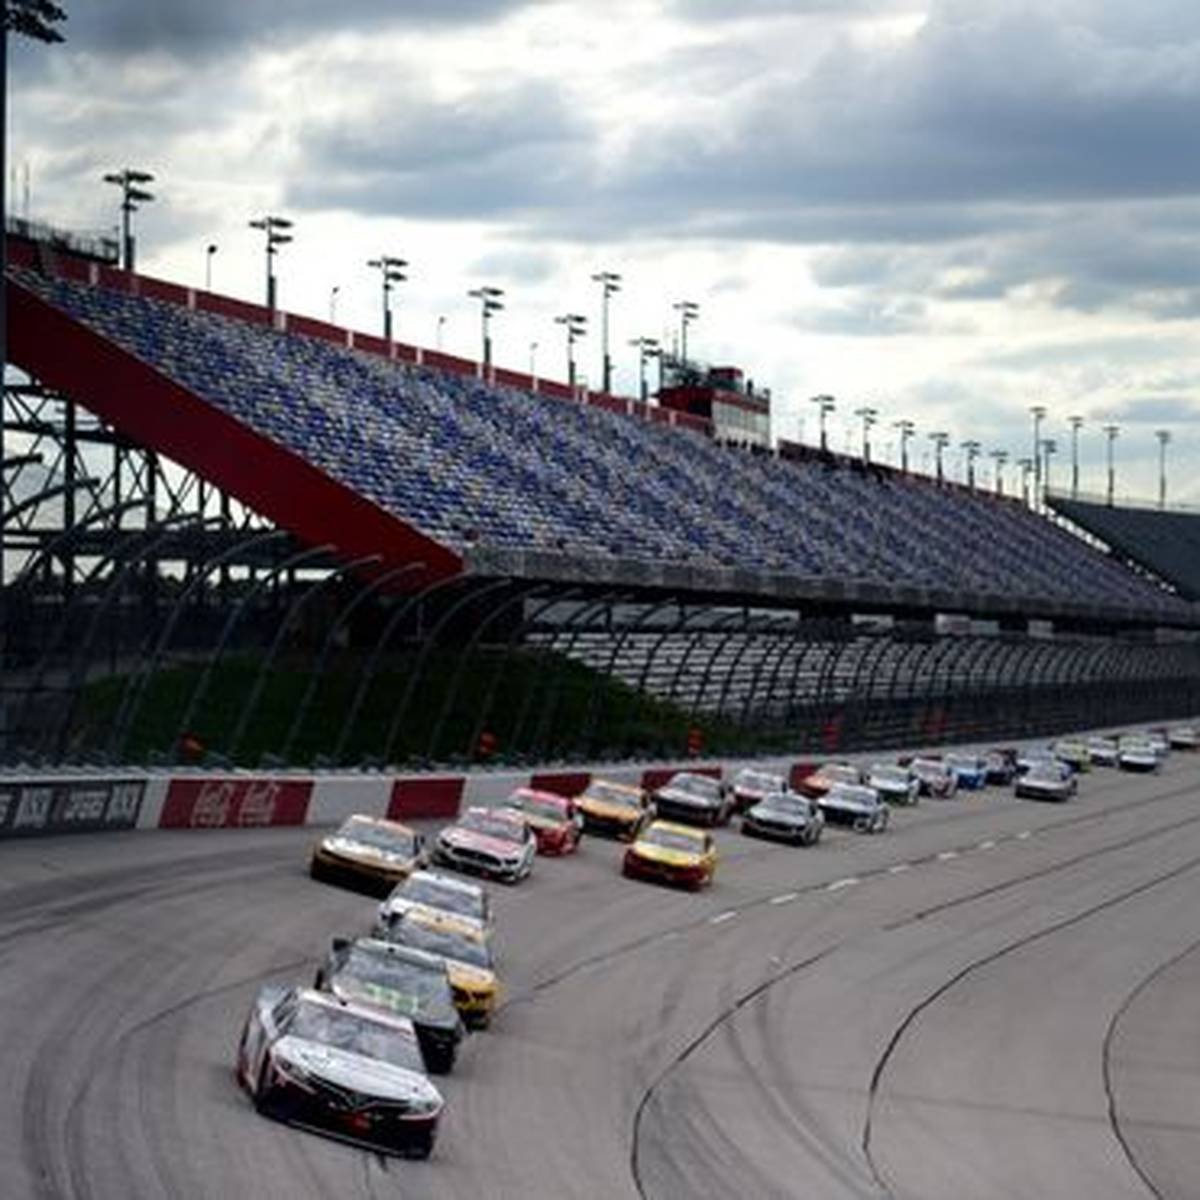 Masken, Crashs, Stille: So lief das NASCAR-Comeback